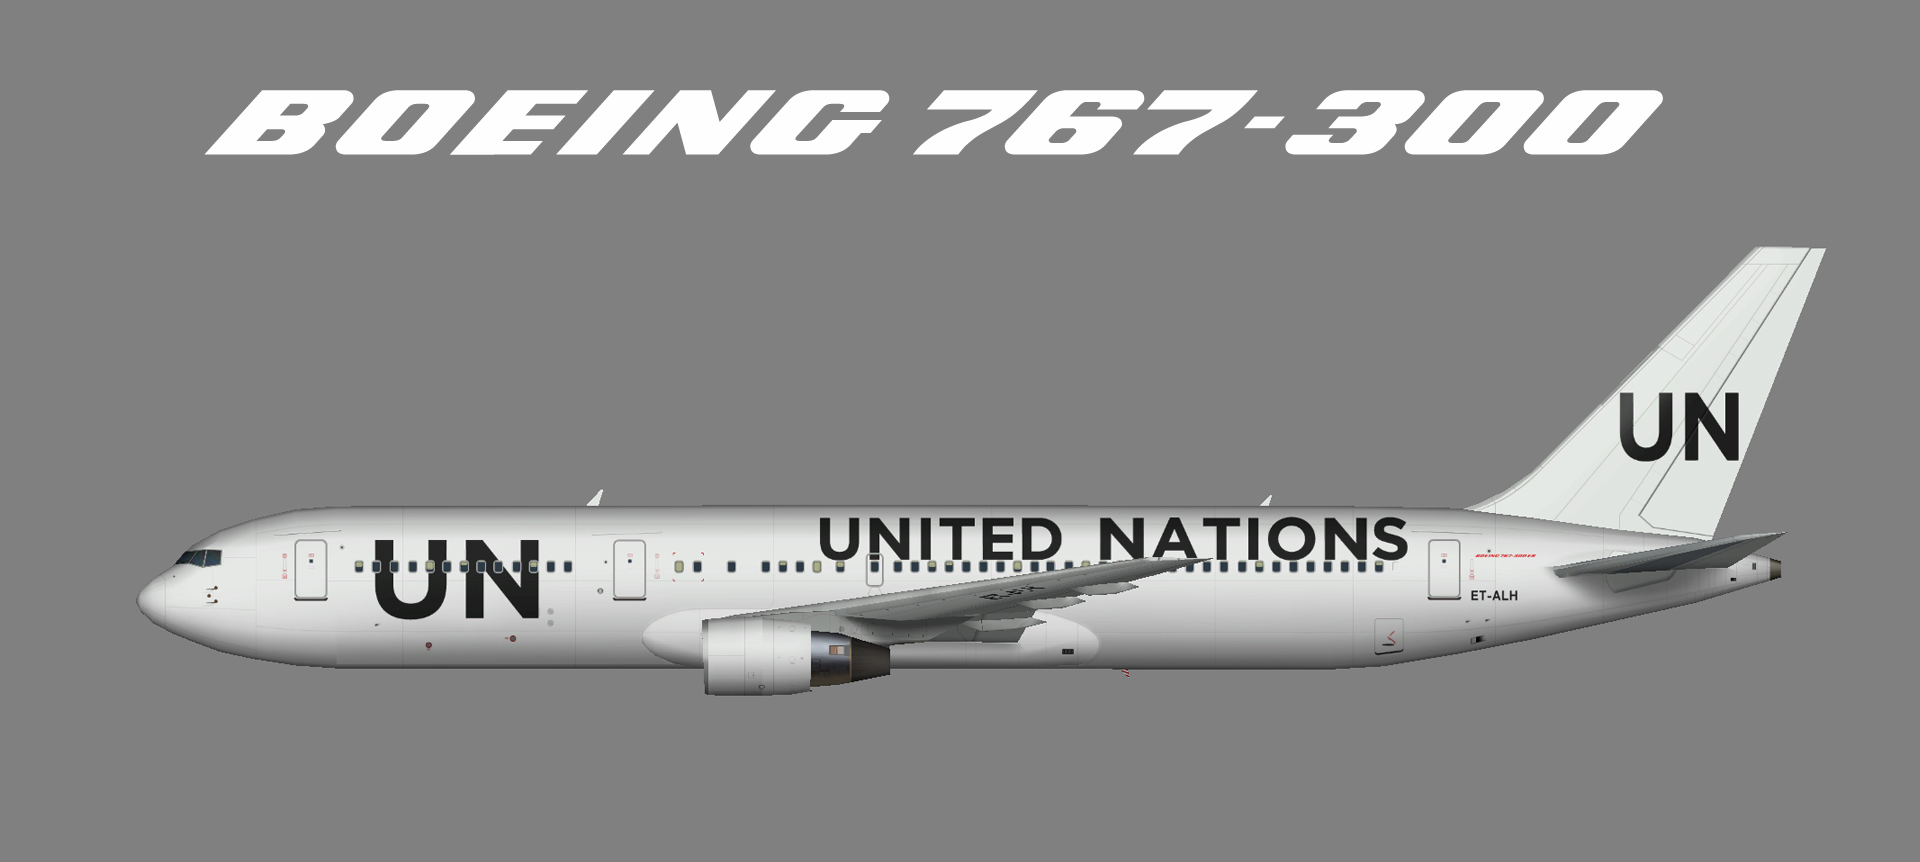 United Nations 767-300